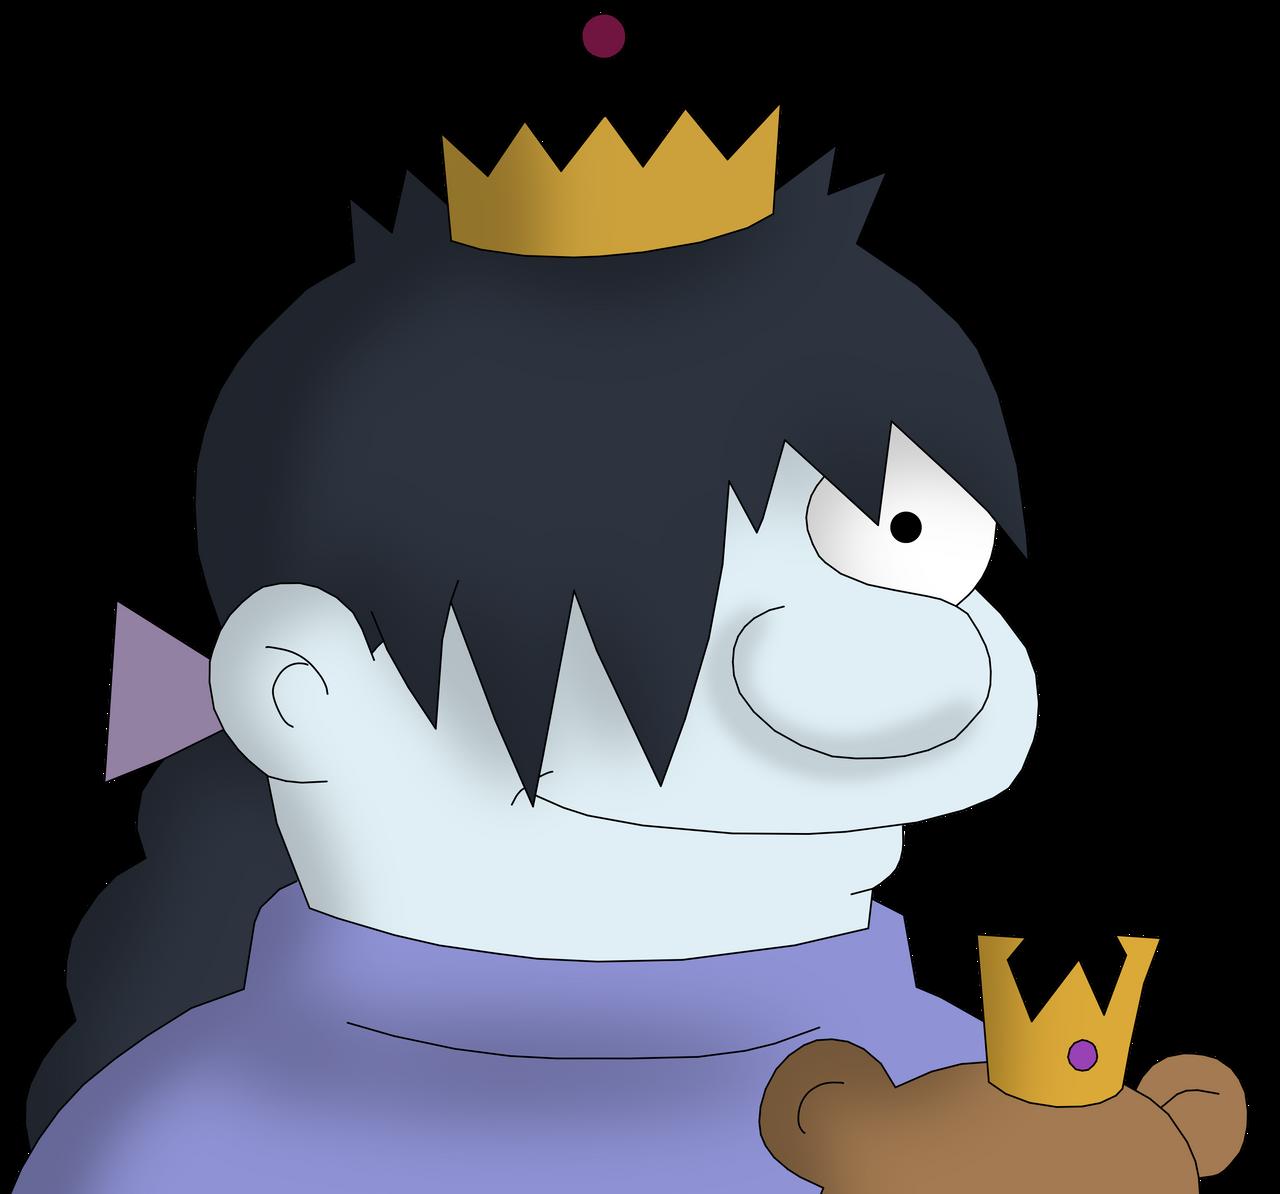 Prince Derek from Disenchantment by CaptainEdwardTeague on DeviantArt